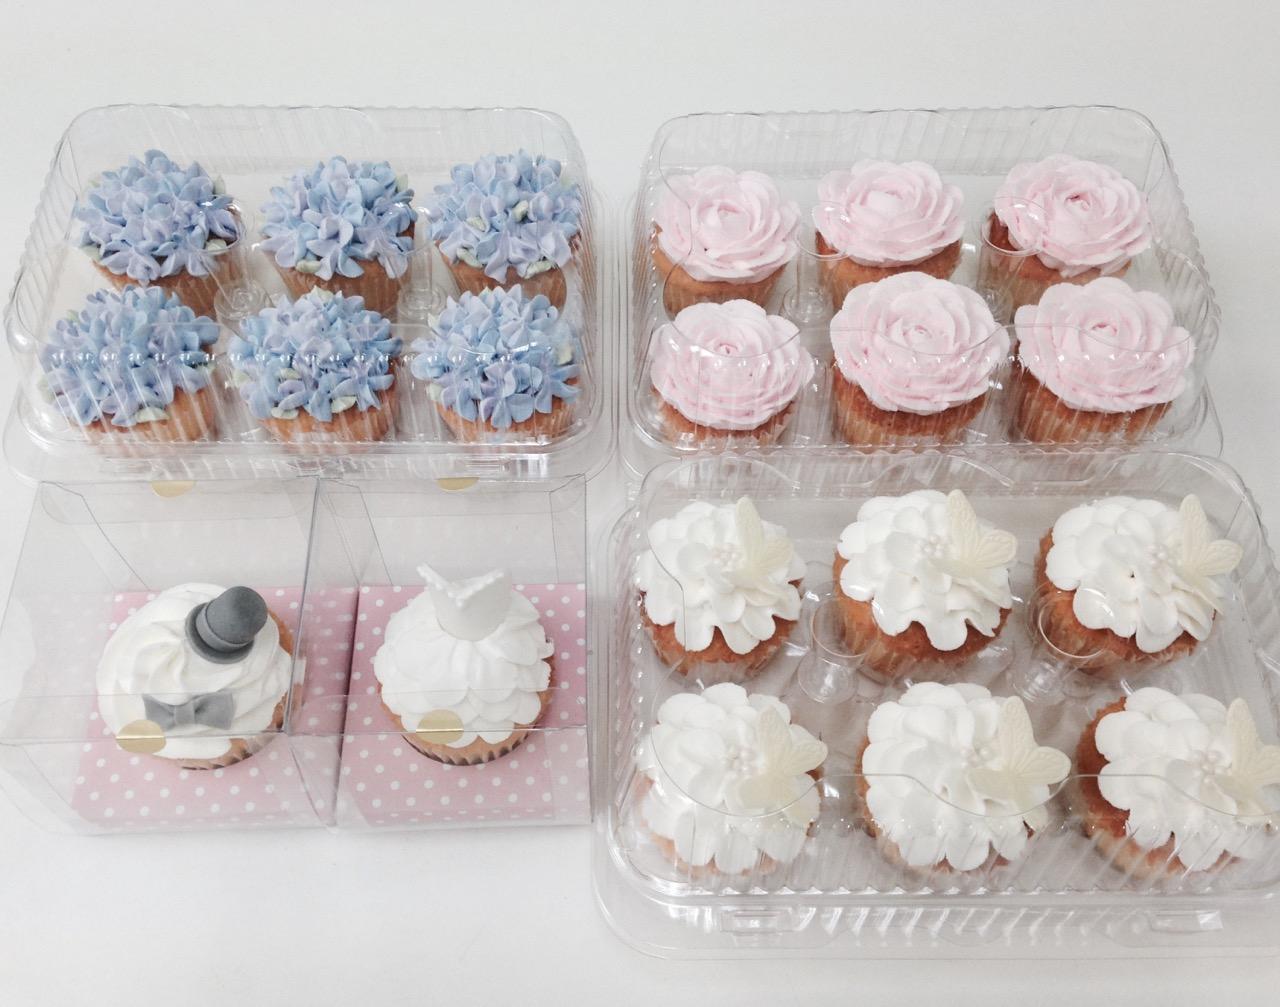 20150721-cupcake0604-5